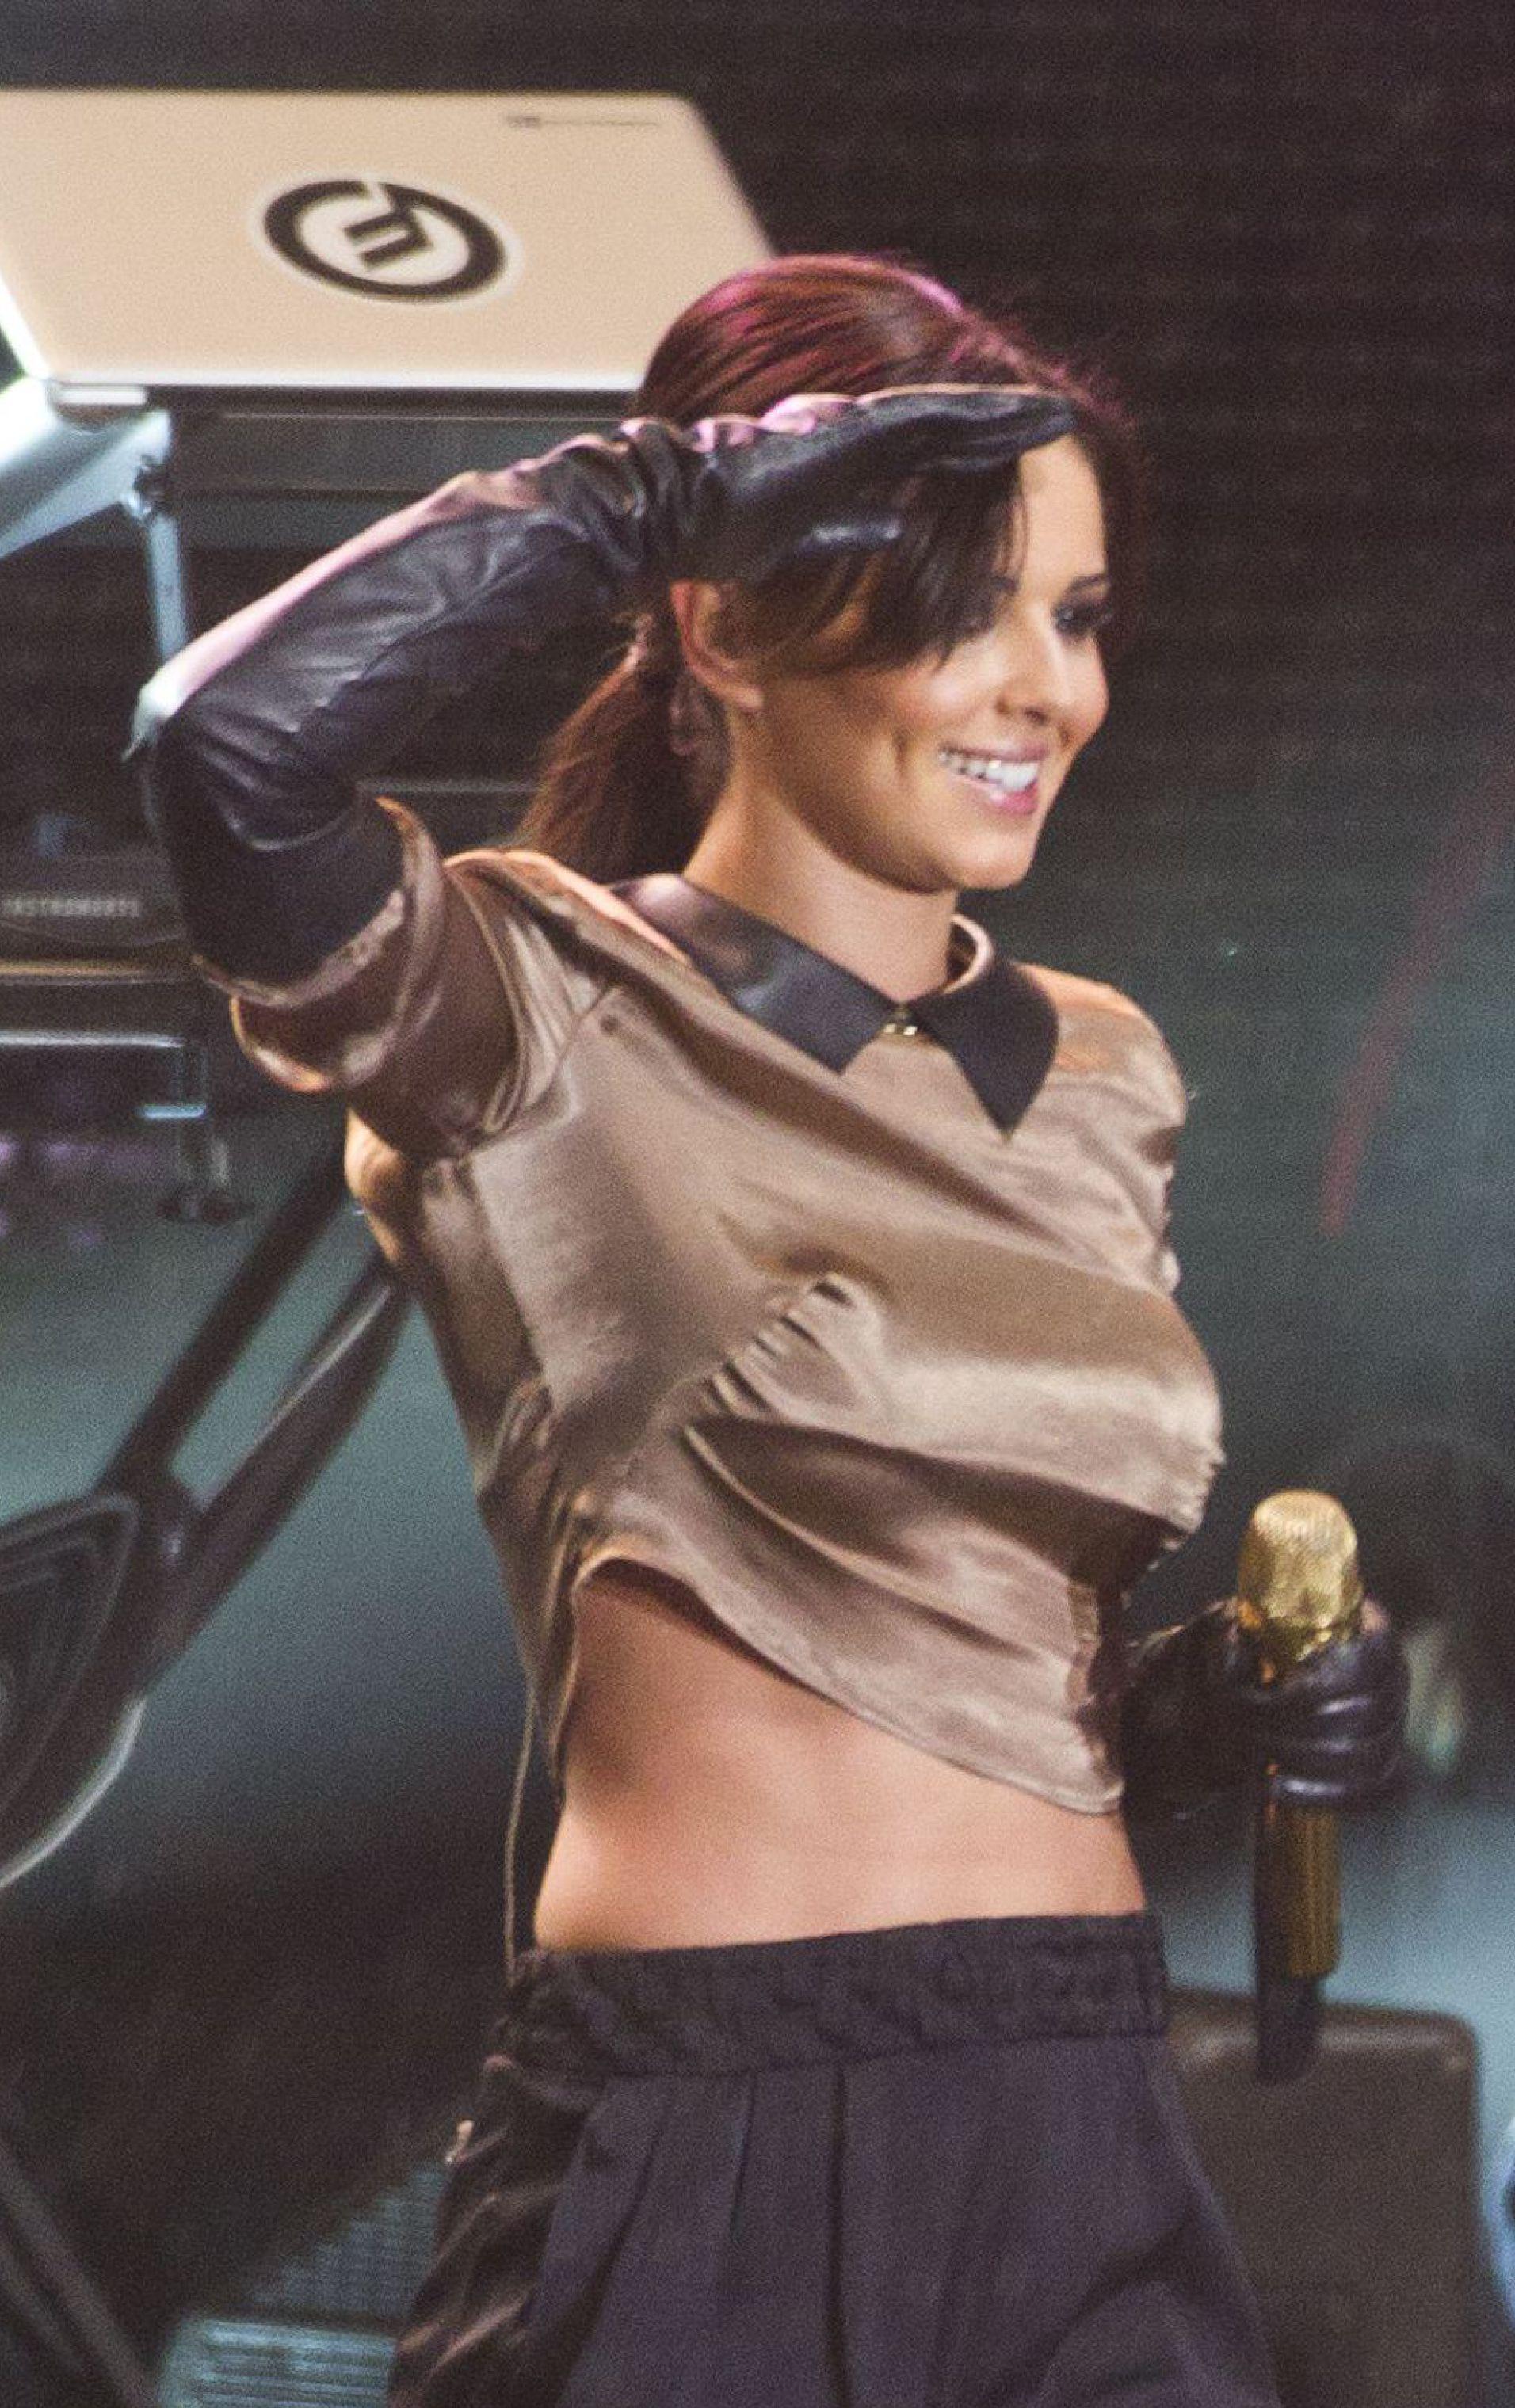 Cheryl Cole - The Voice_0005.jpg